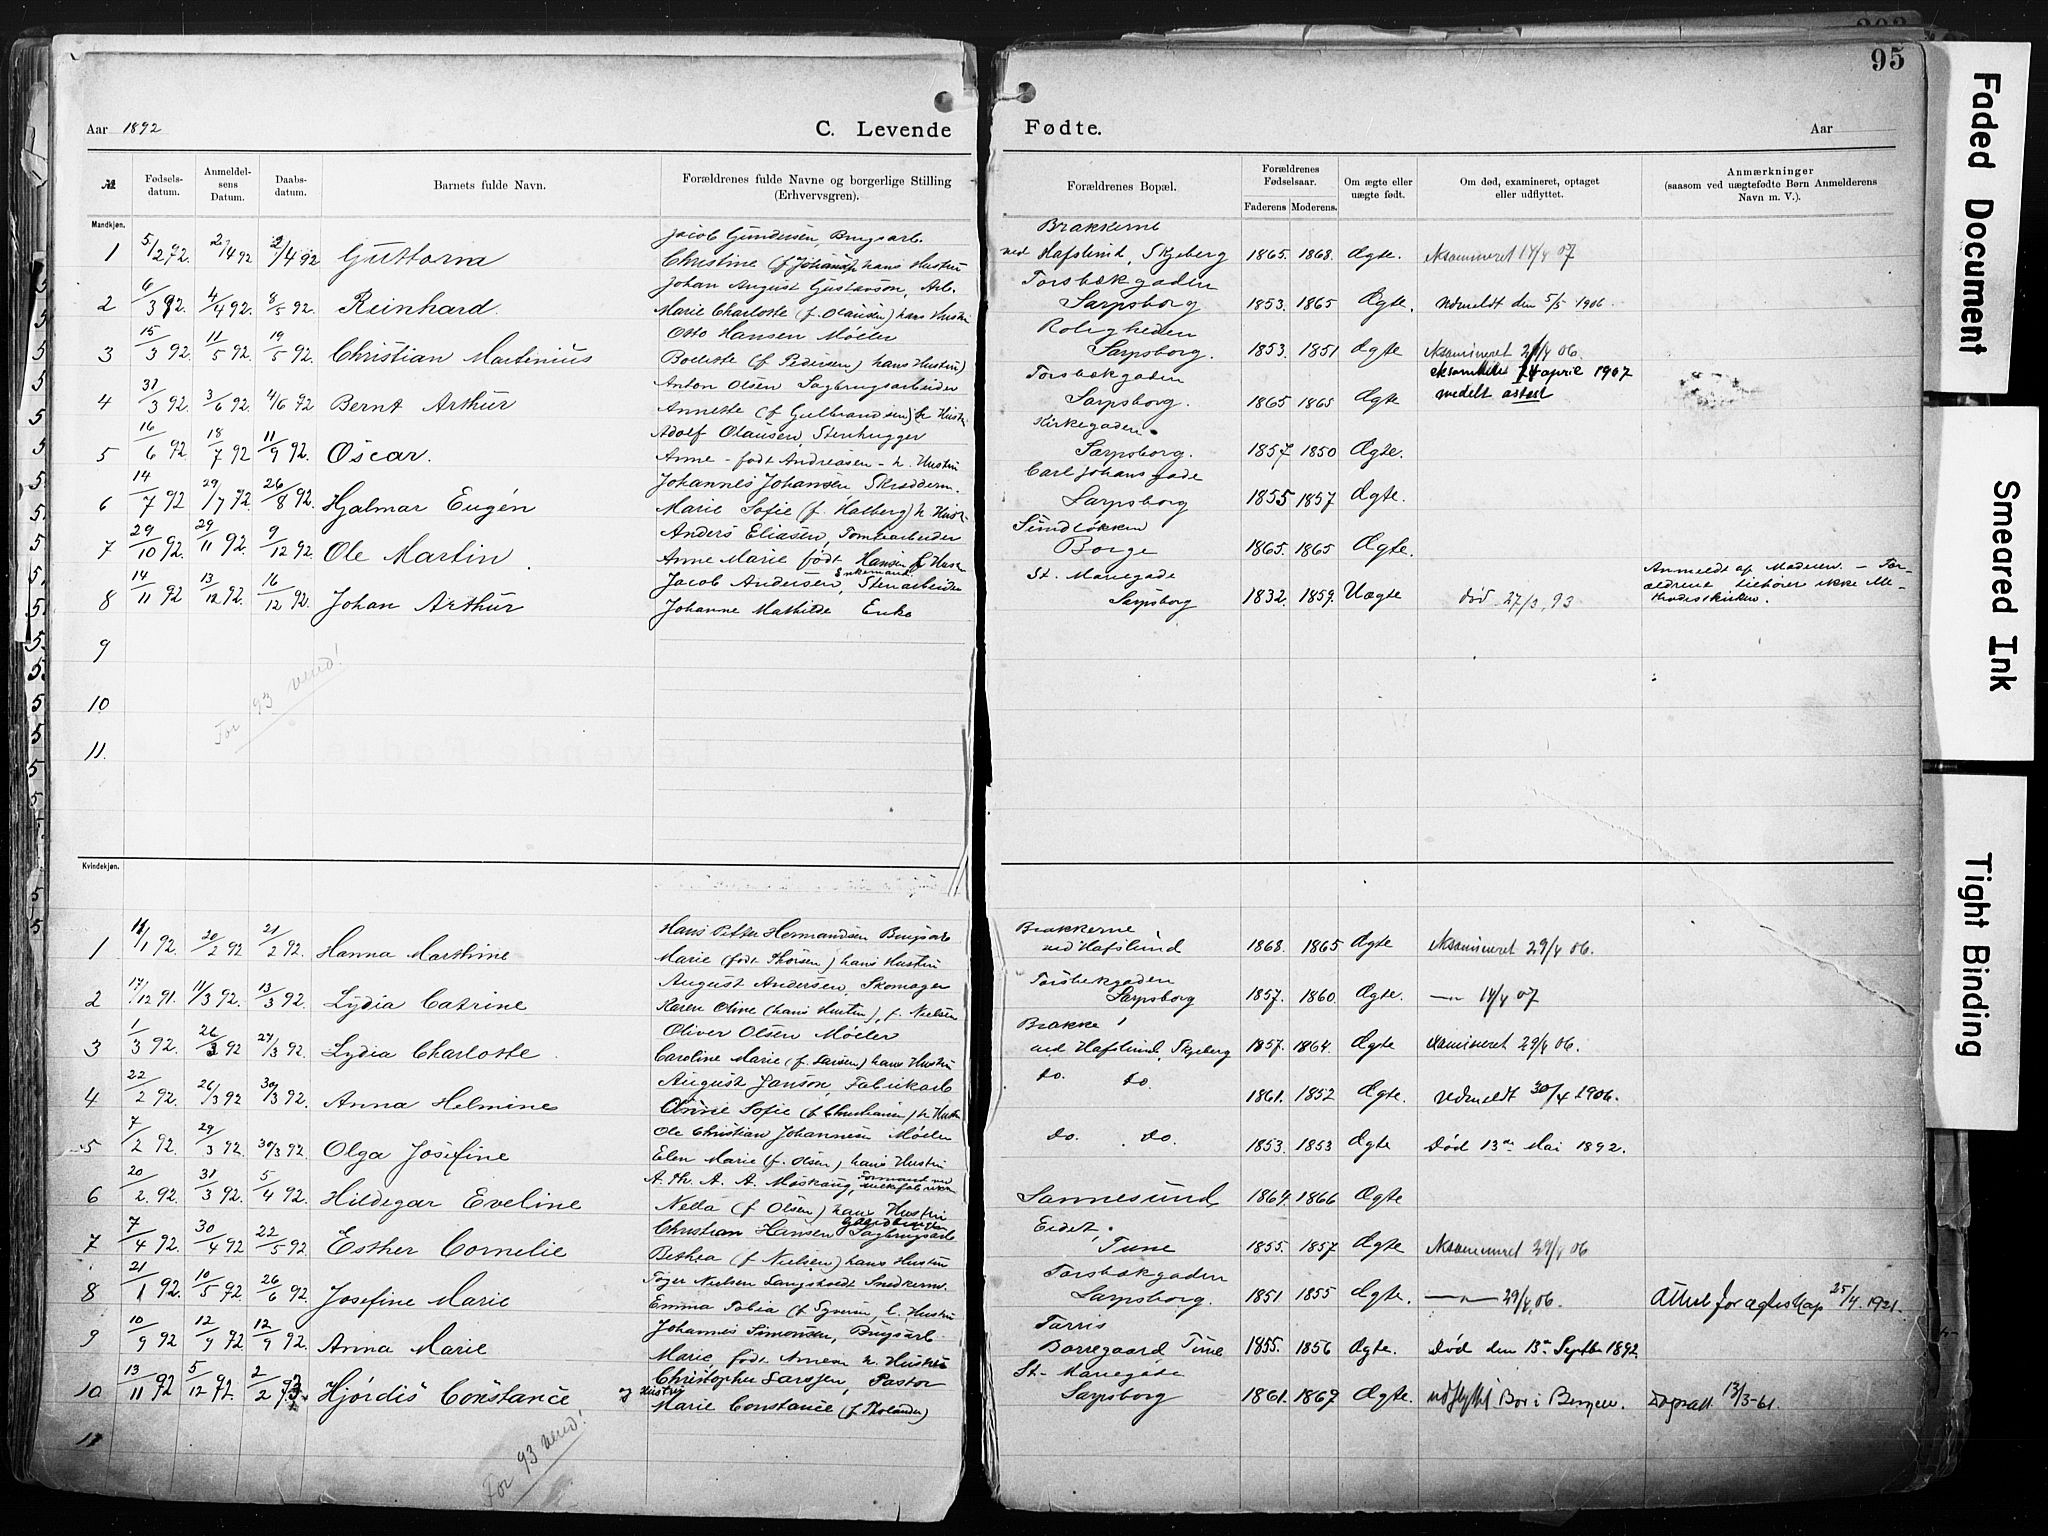 SAO, Sarpsborg metodistkirke, A/L0004: Dissenterprotokoll nr. 4, 1892-1923, s. 95